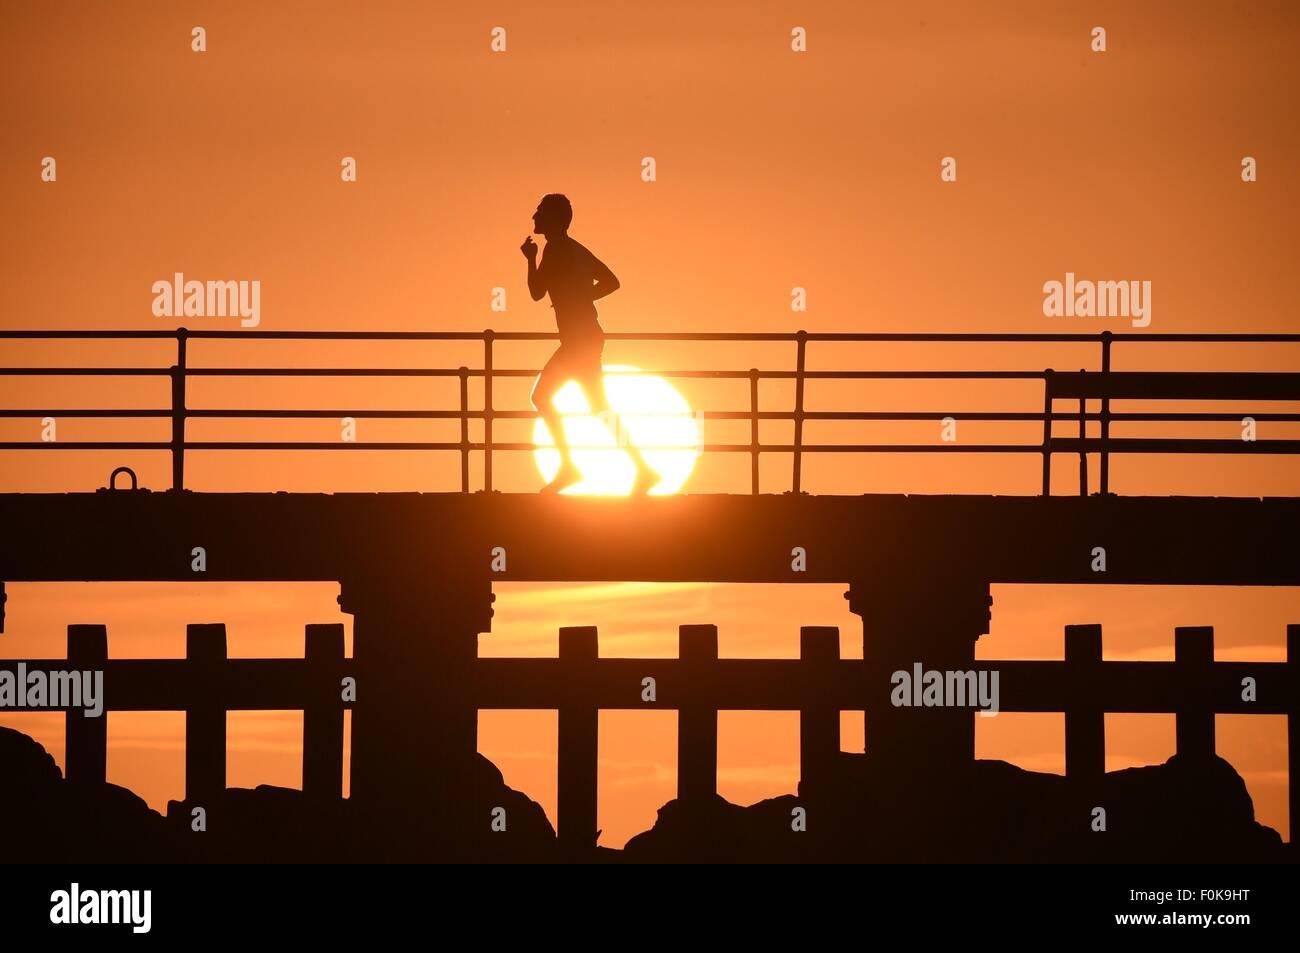 Aberystwyth, Wales, UK. 17. August 2015. UK-Wetter: Ein einsamer Mann joggt Silhouette bei Sonnenuntergang entlang Stockbild